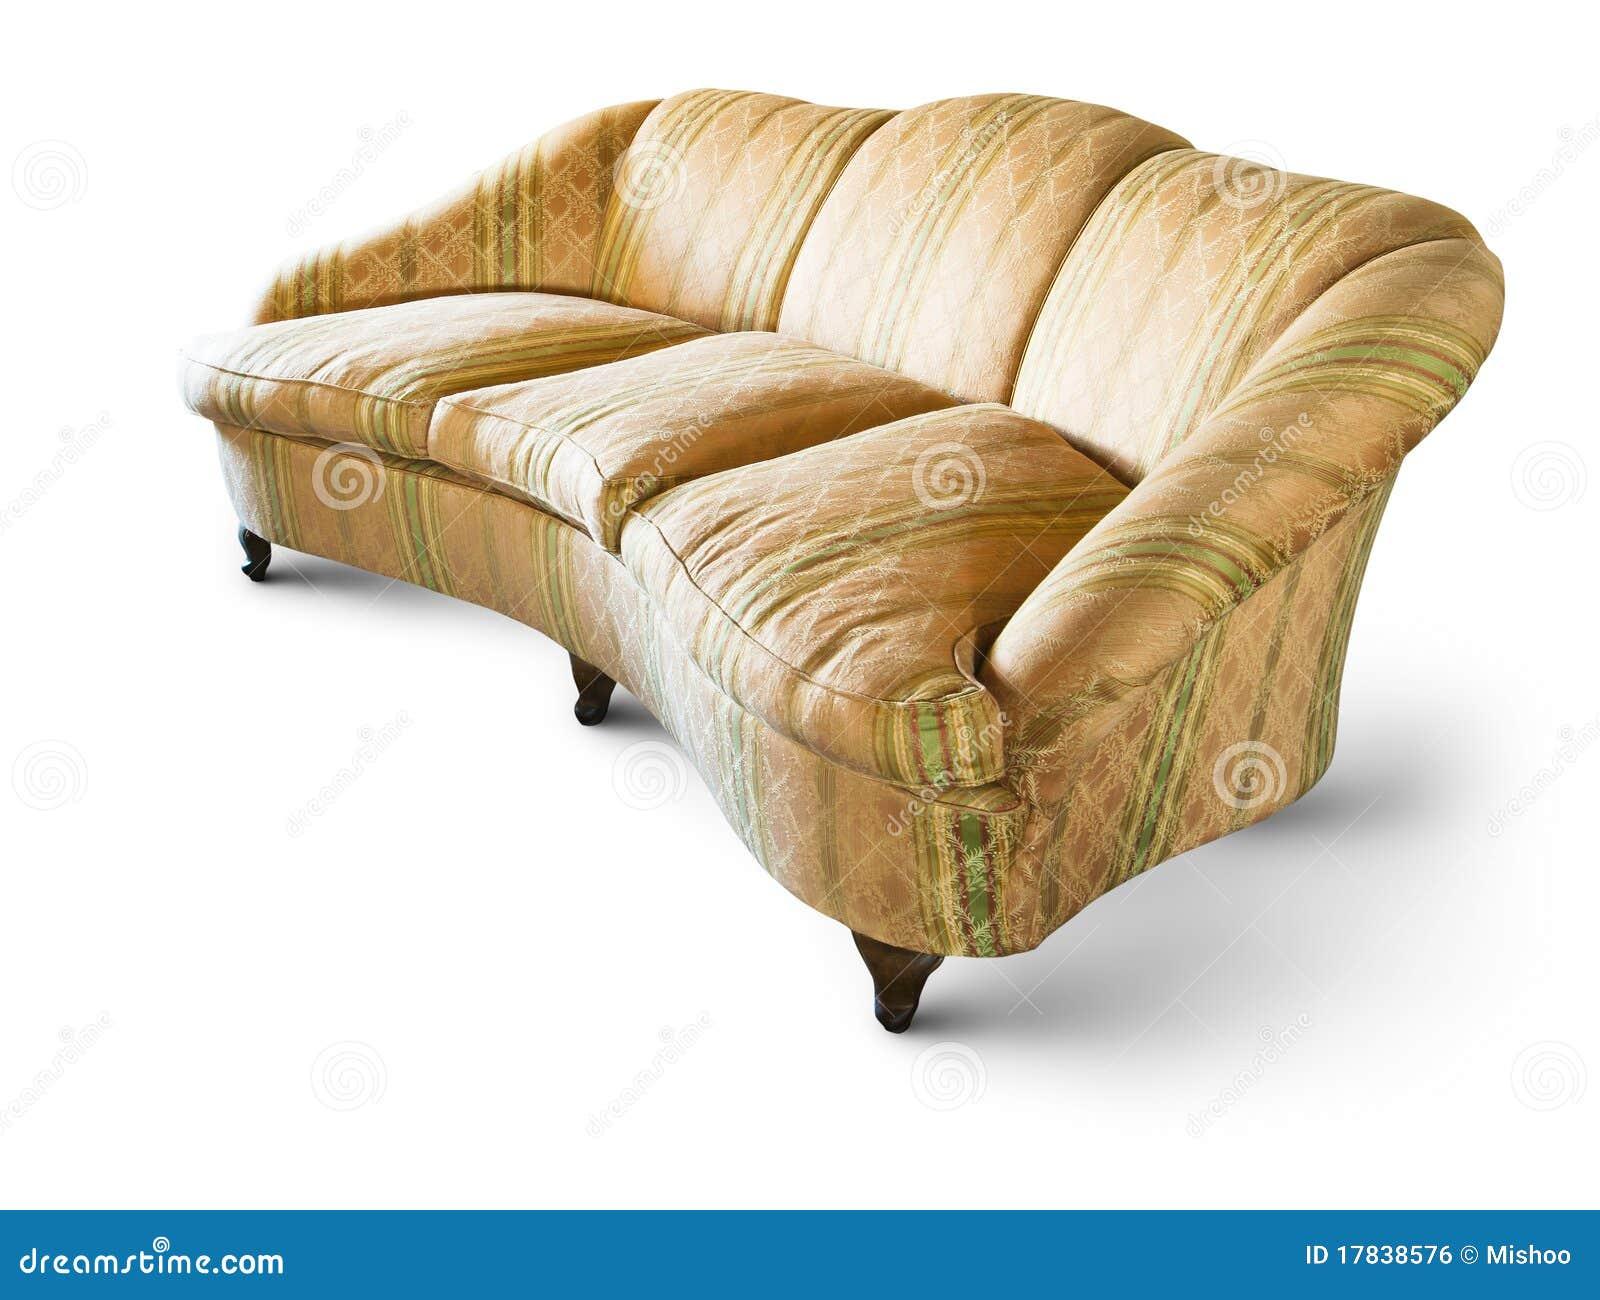 sehr altes sofa lizenzfreies stockbild bild 17838576. Black Bedroom Furniture Sets. Home Design Ideas